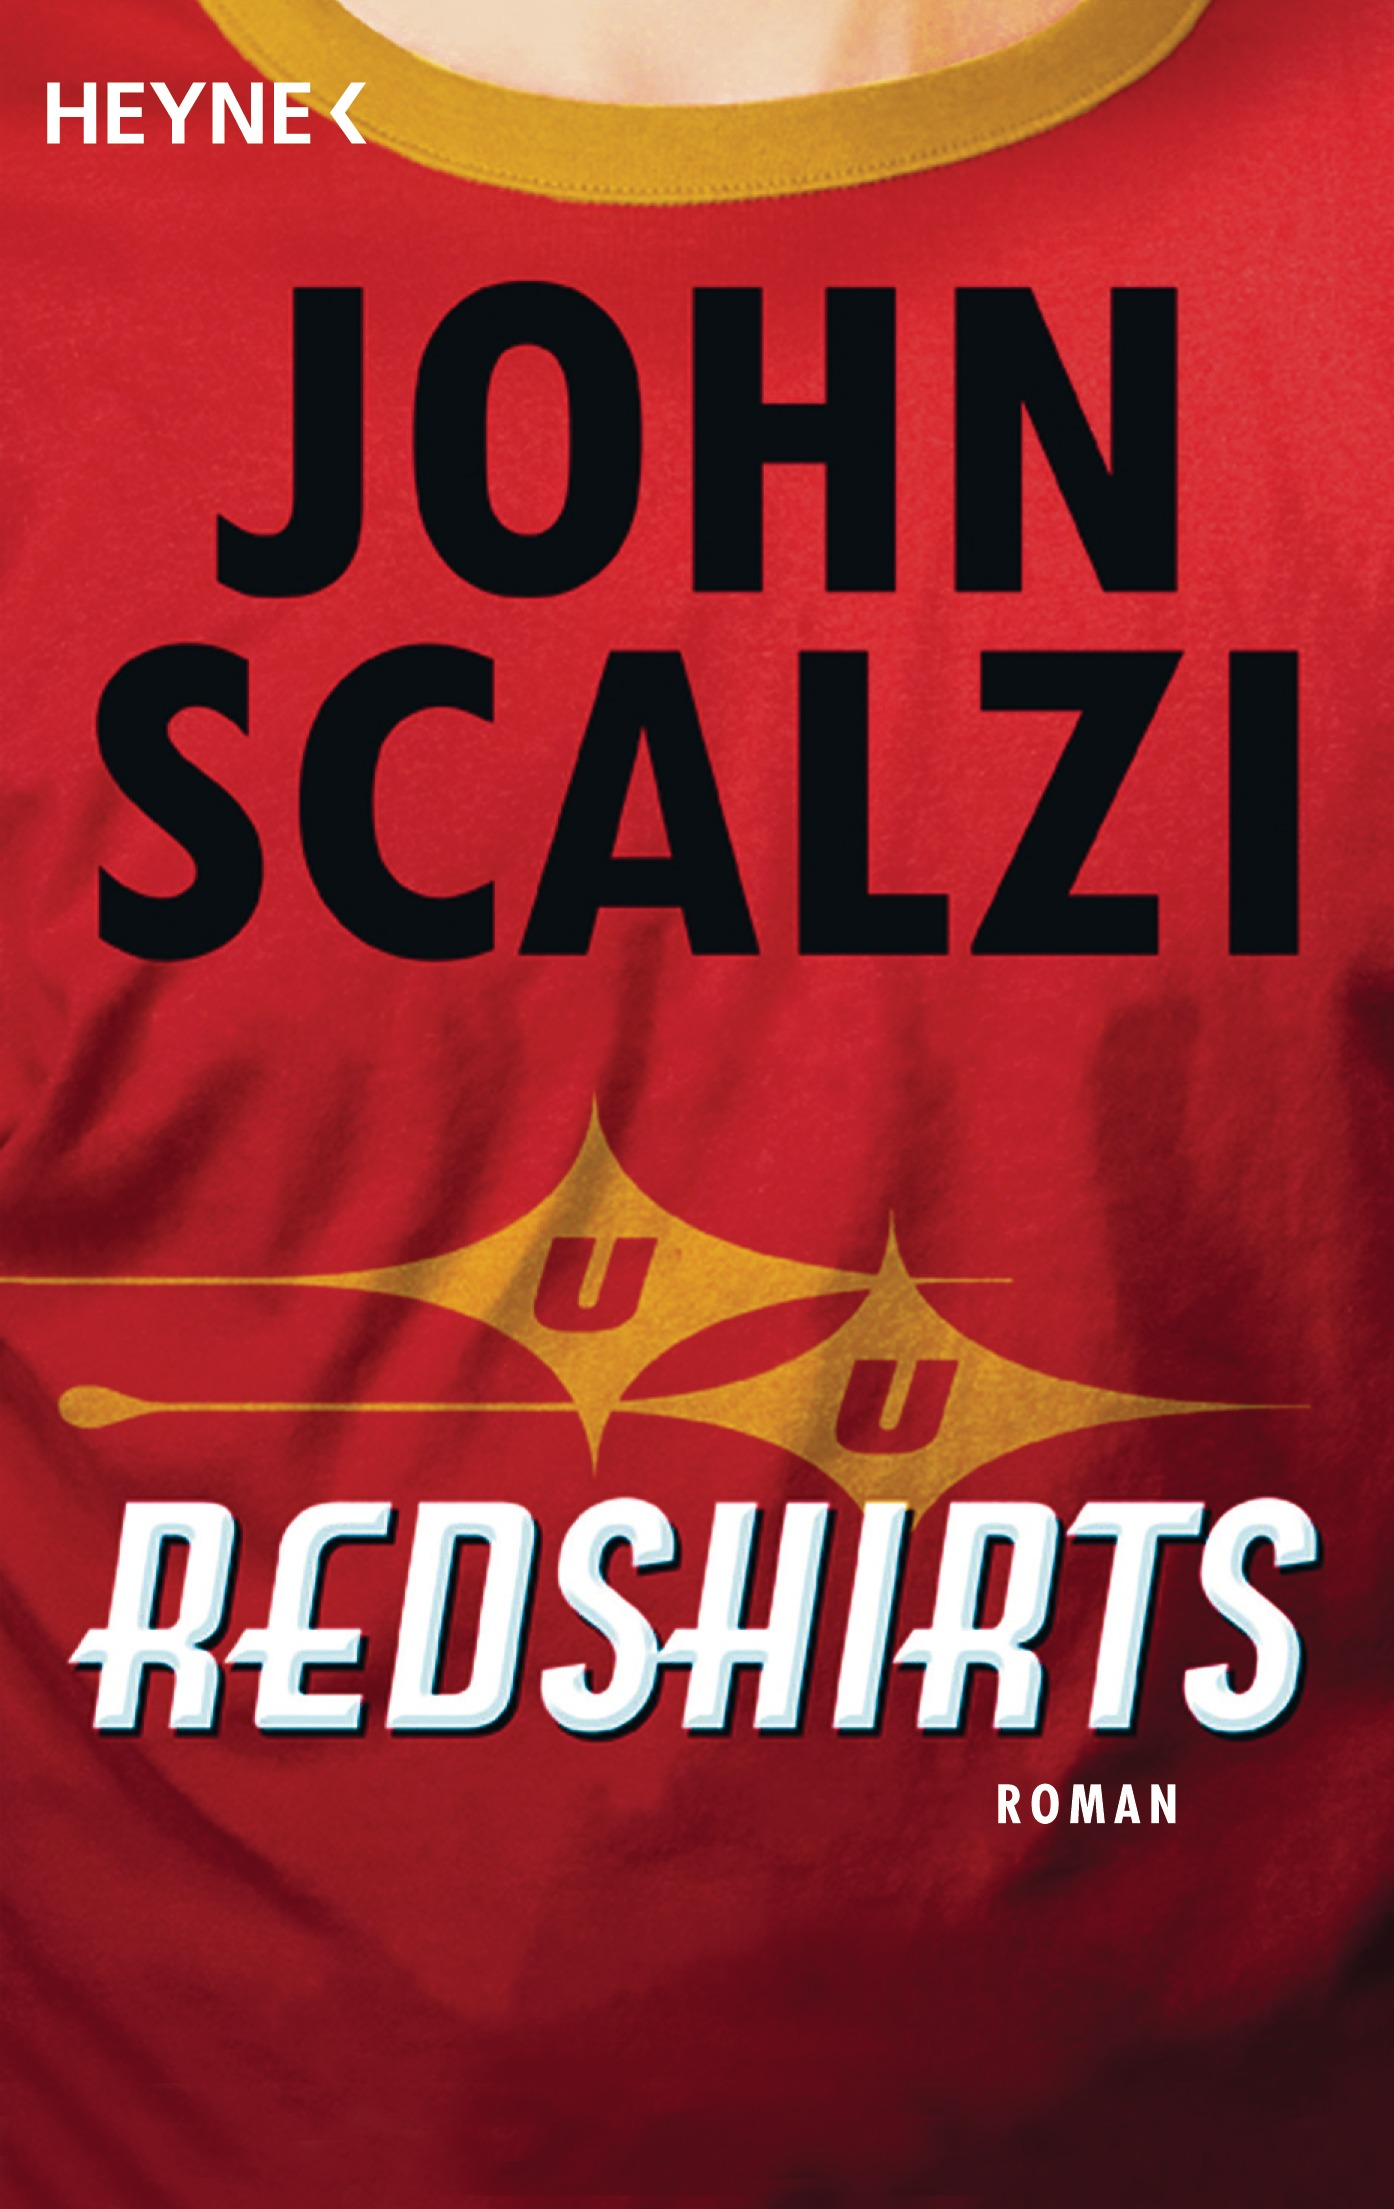 Redshirts: Roman - John Scalzi